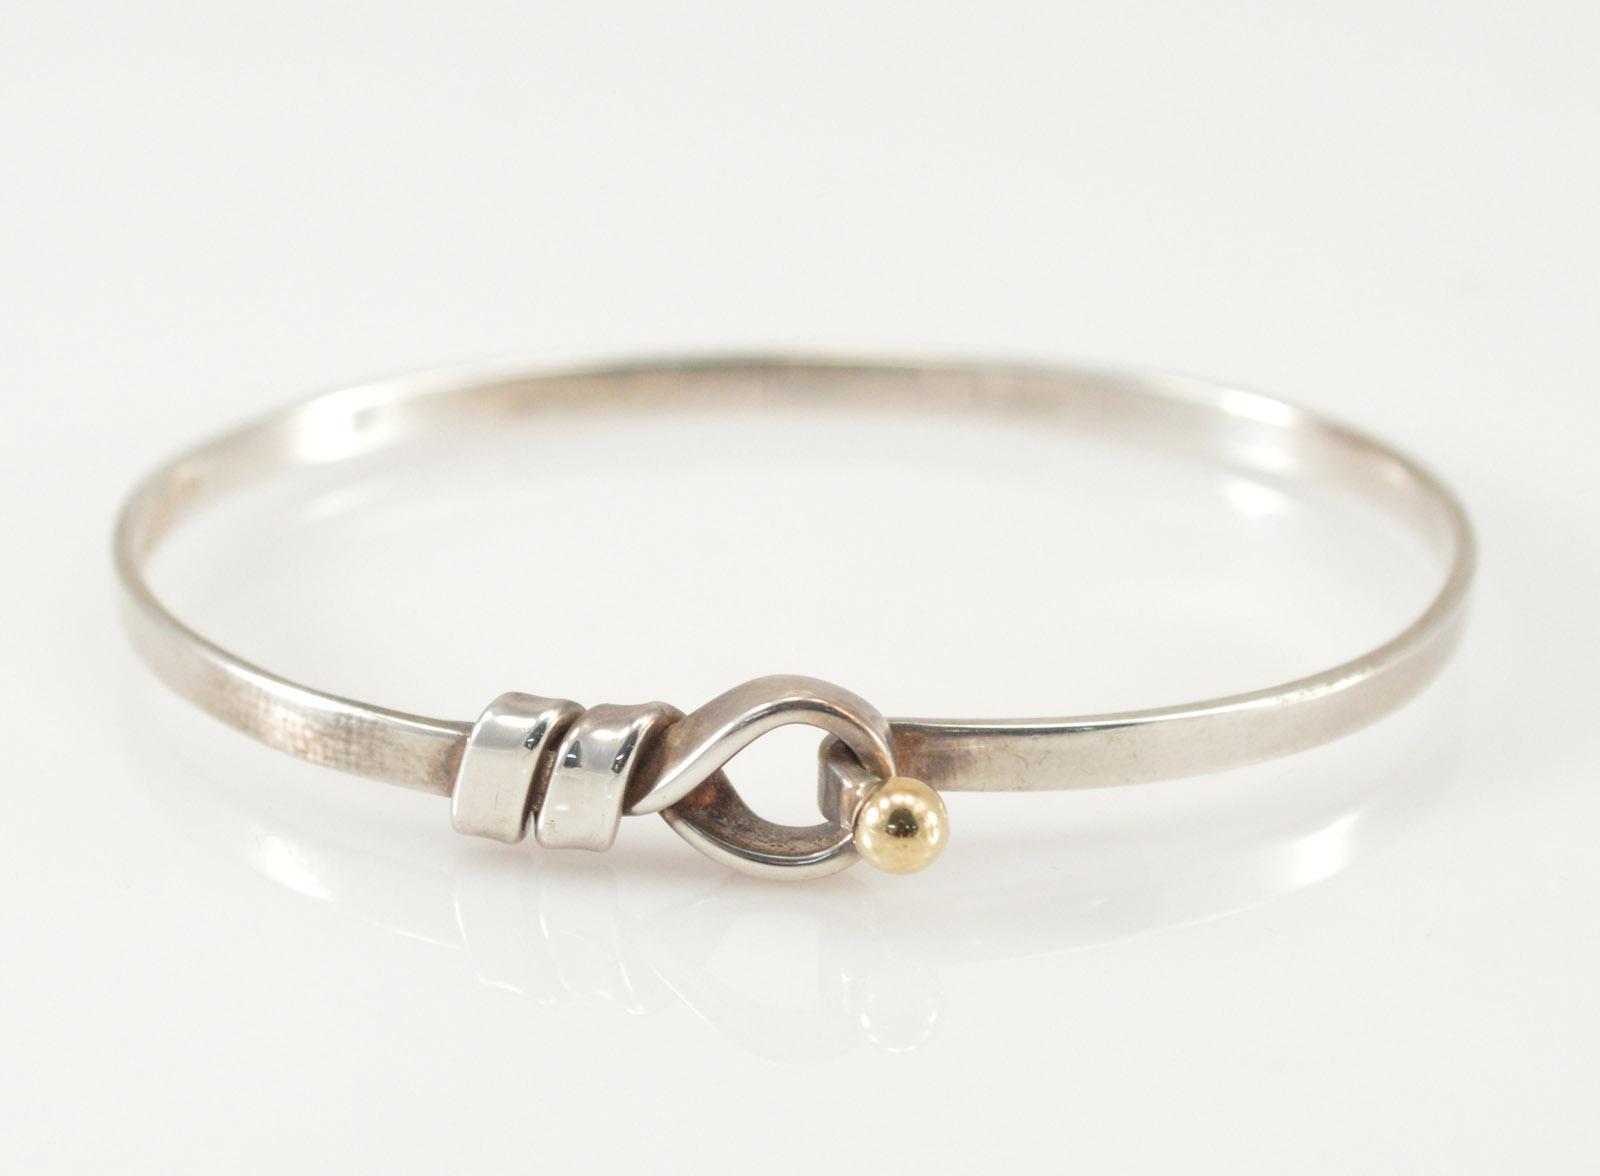 9 4g Solid Silver Tiffany Co 18k Gold Hook Bracelet 2 25 Sterling Marked 750 925